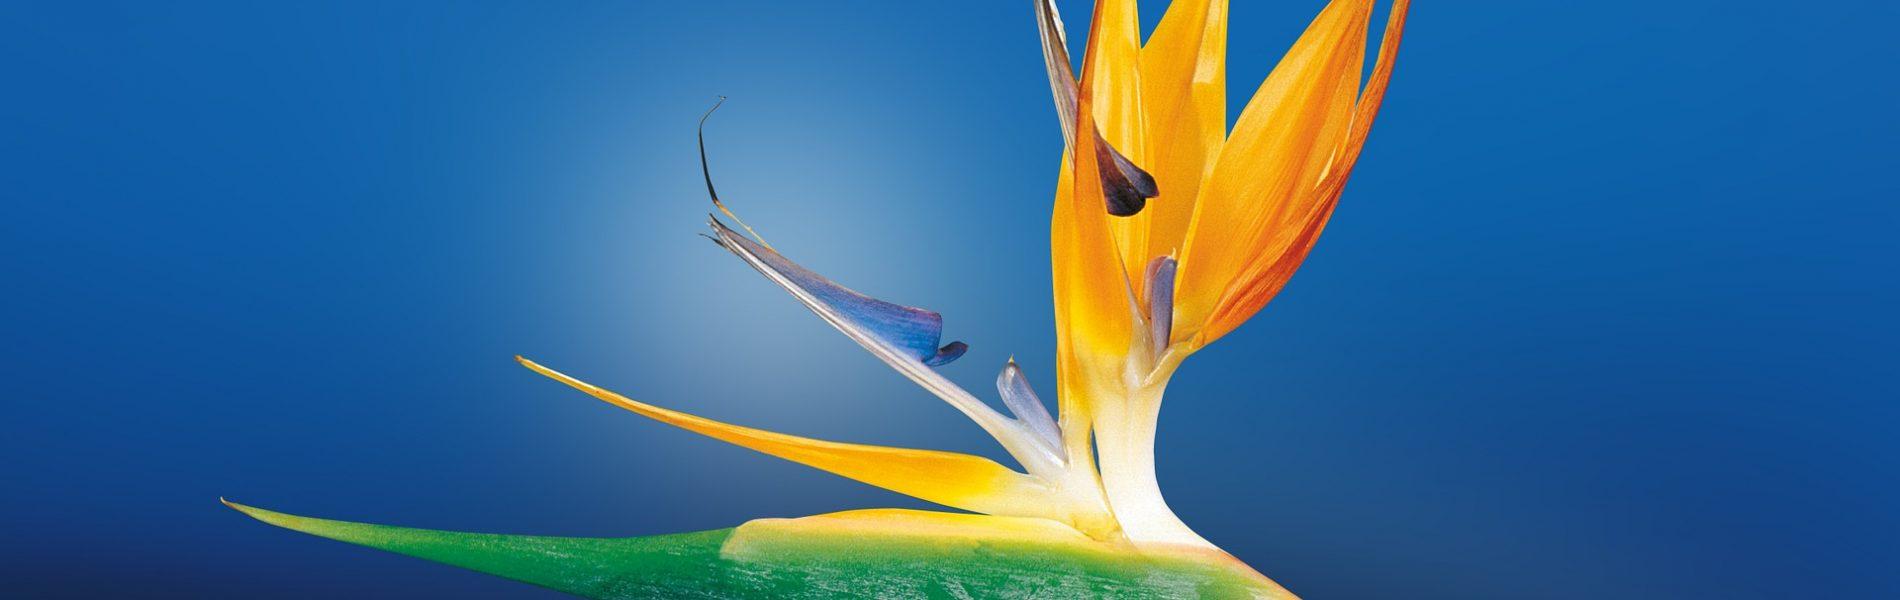 bird-of-paradise-flower-1073282_1920